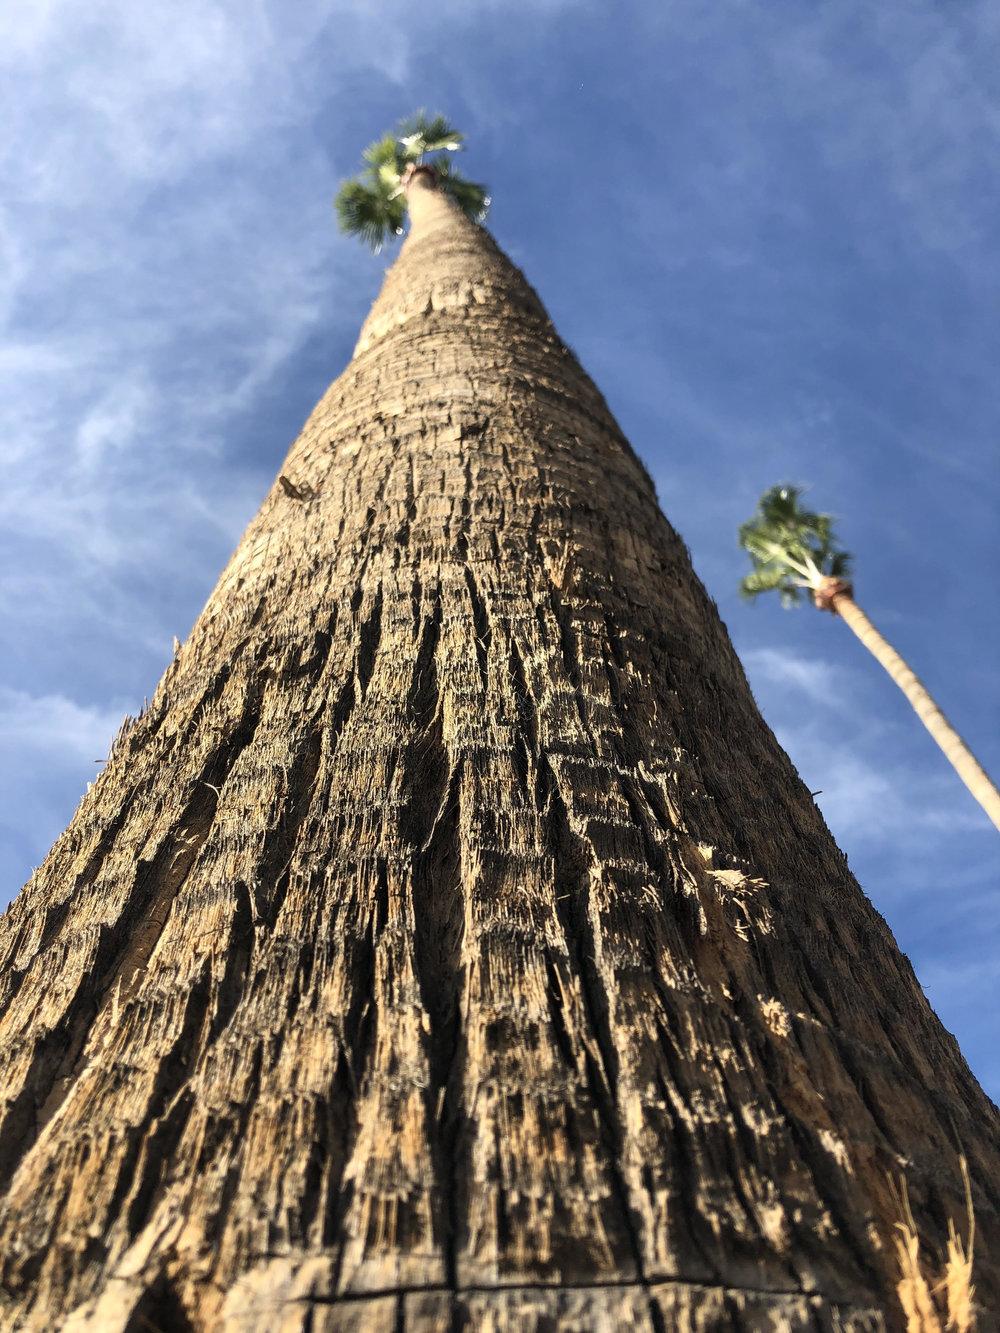 Palm Tree - Phoenix, AZ